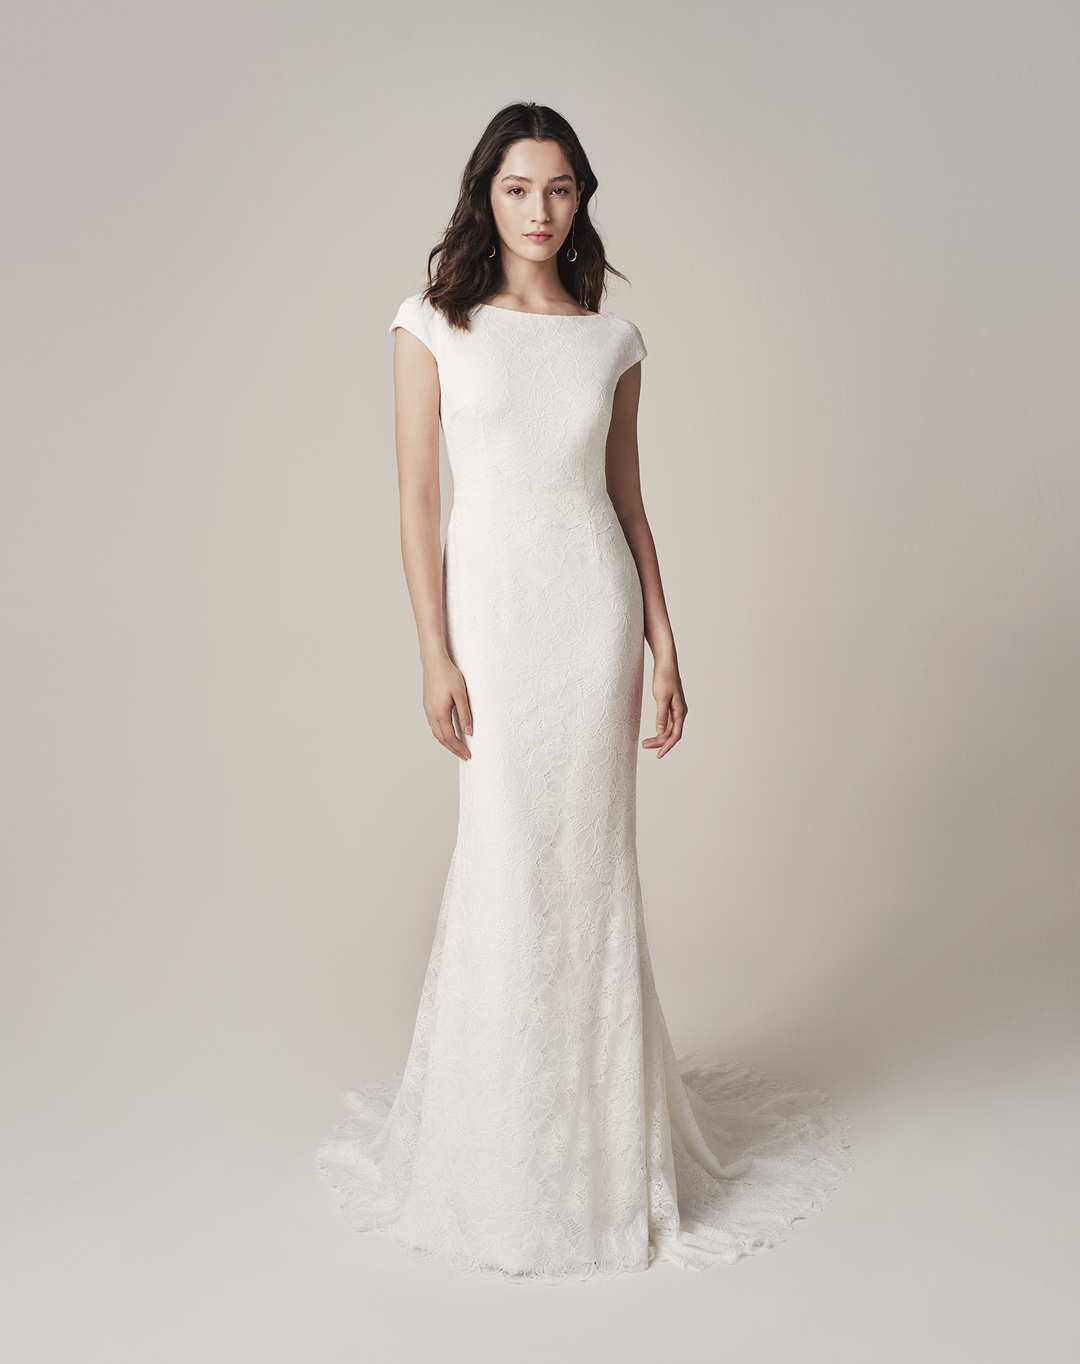 239 dress photo